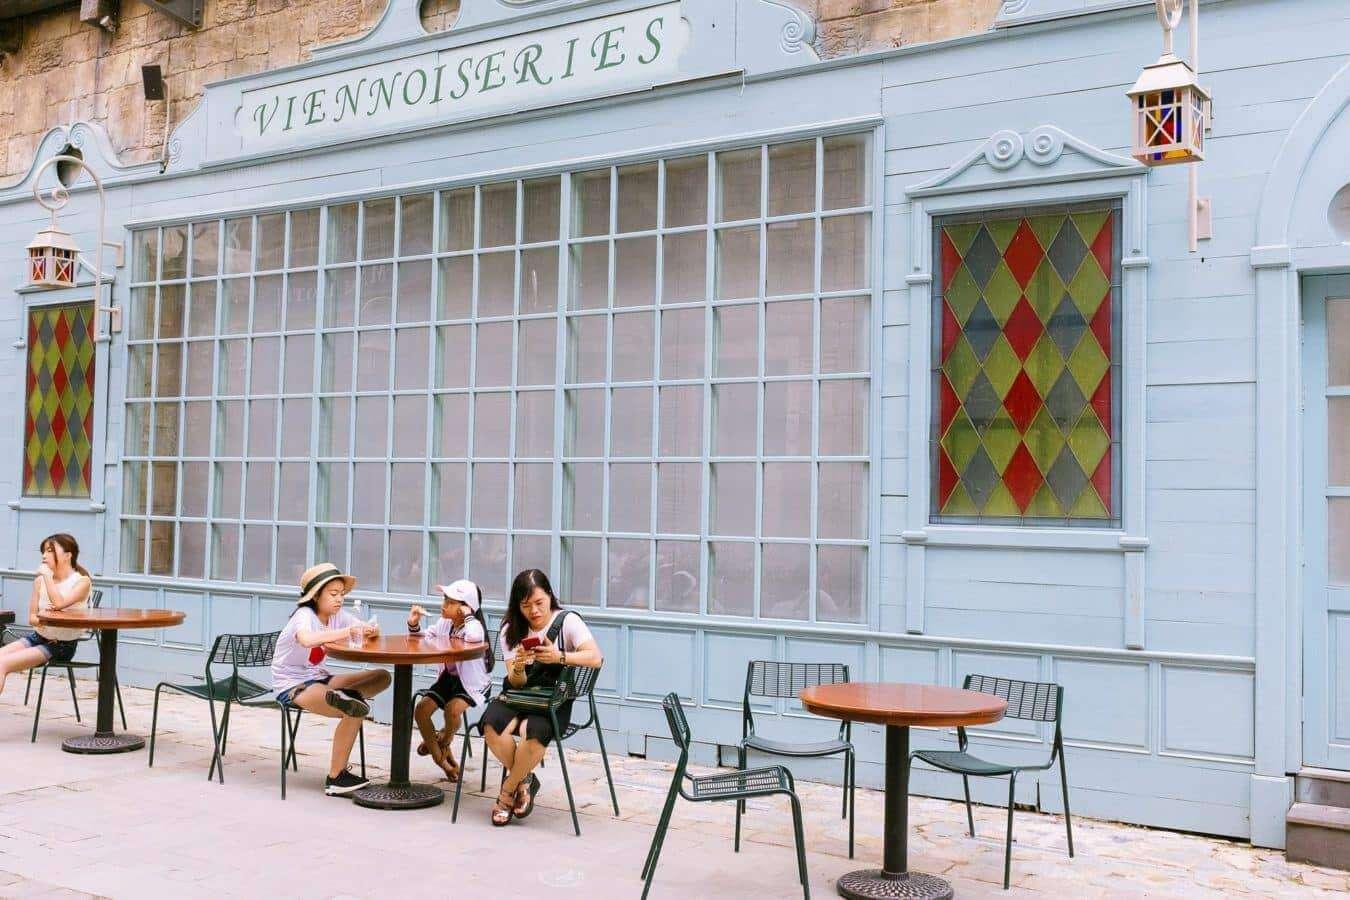 European-style cafes